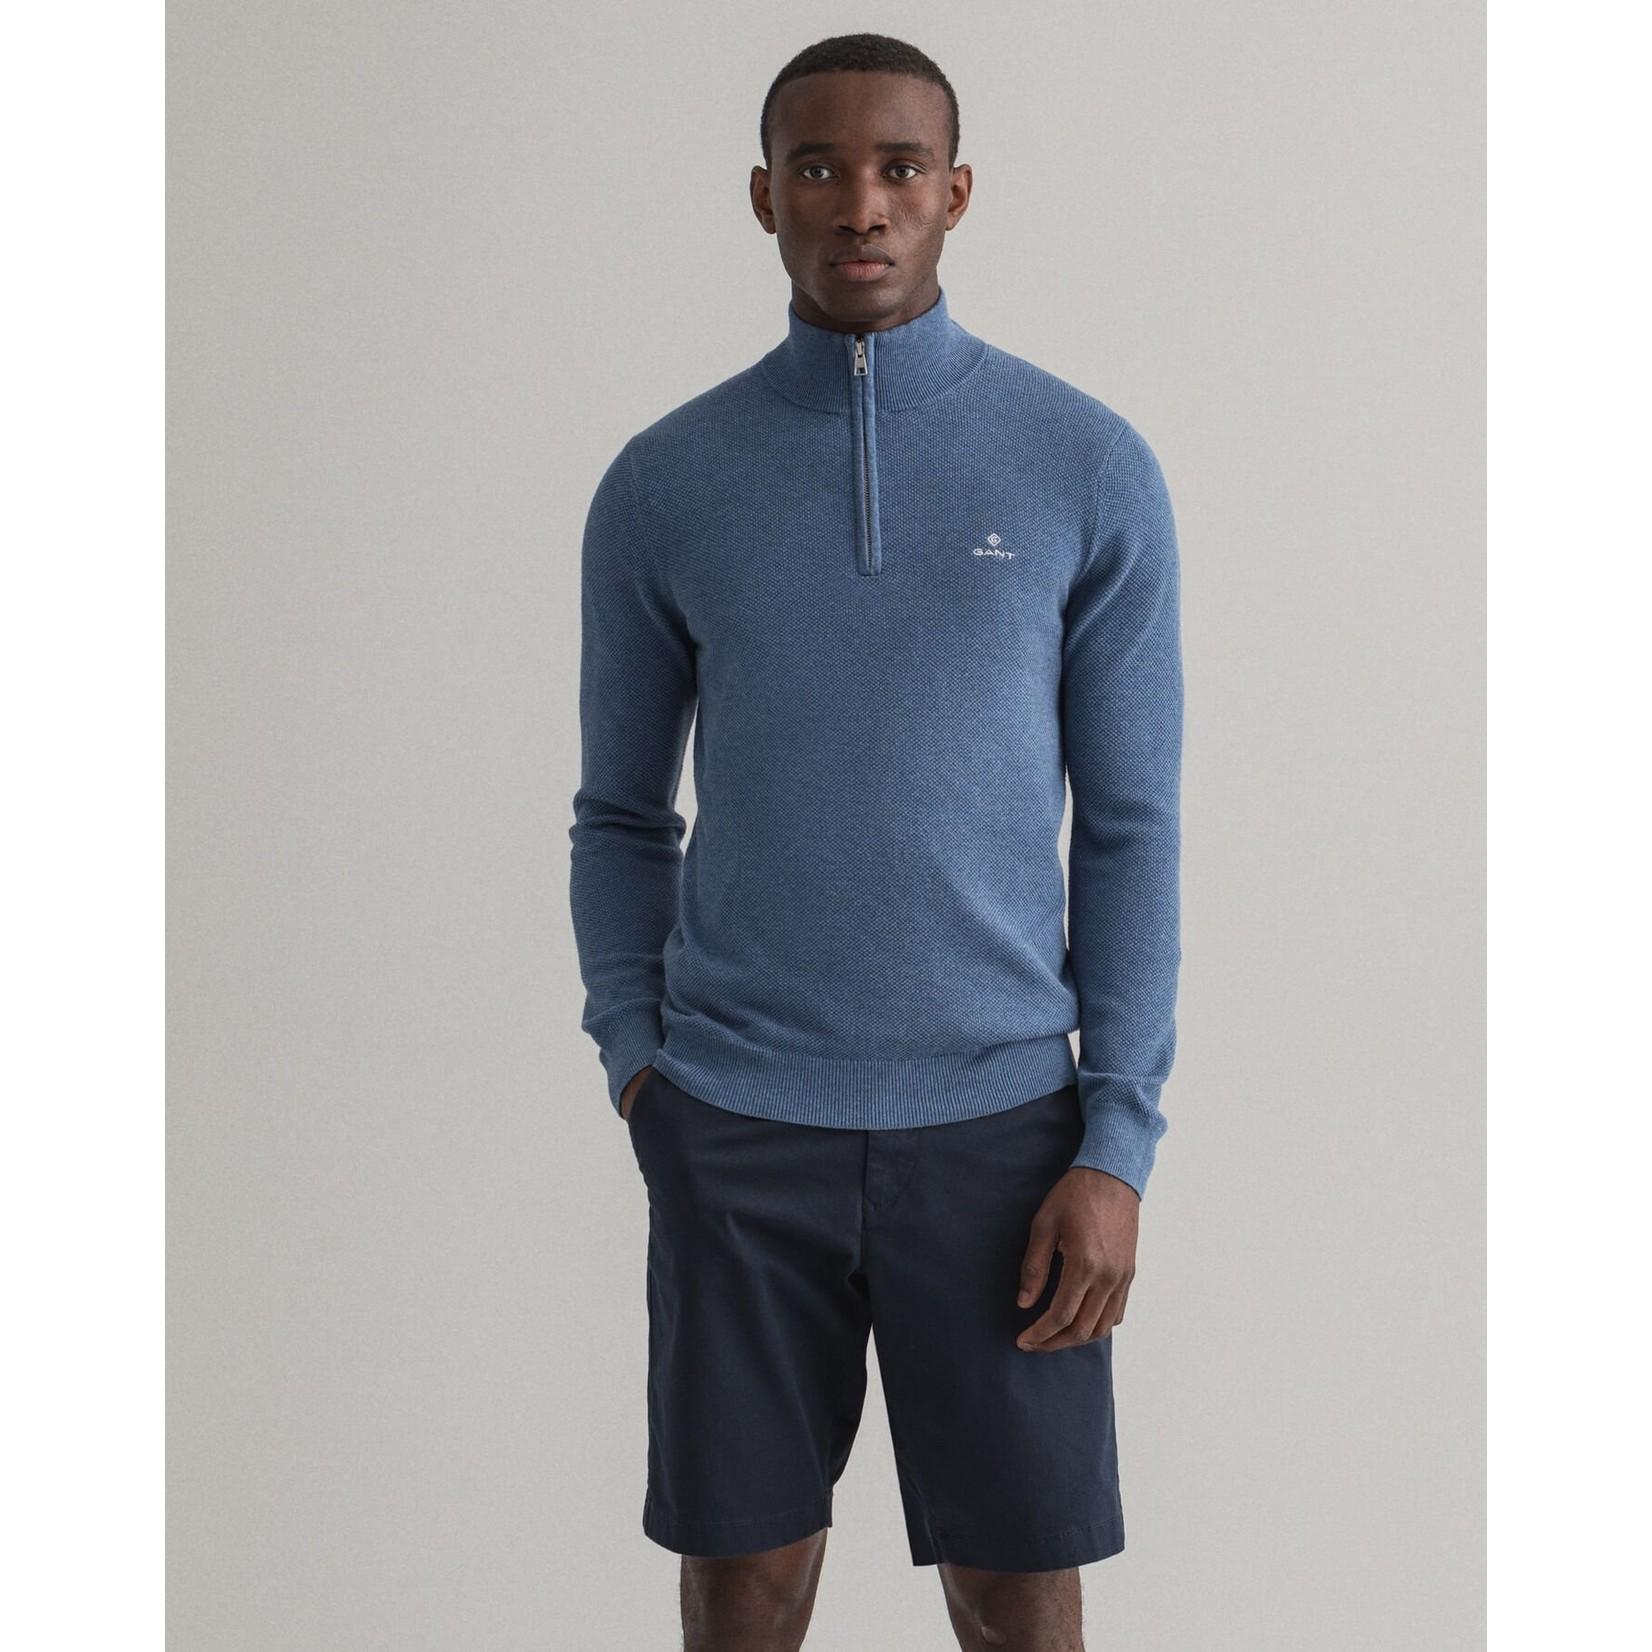 GANT sweater met korte rits denim blauw